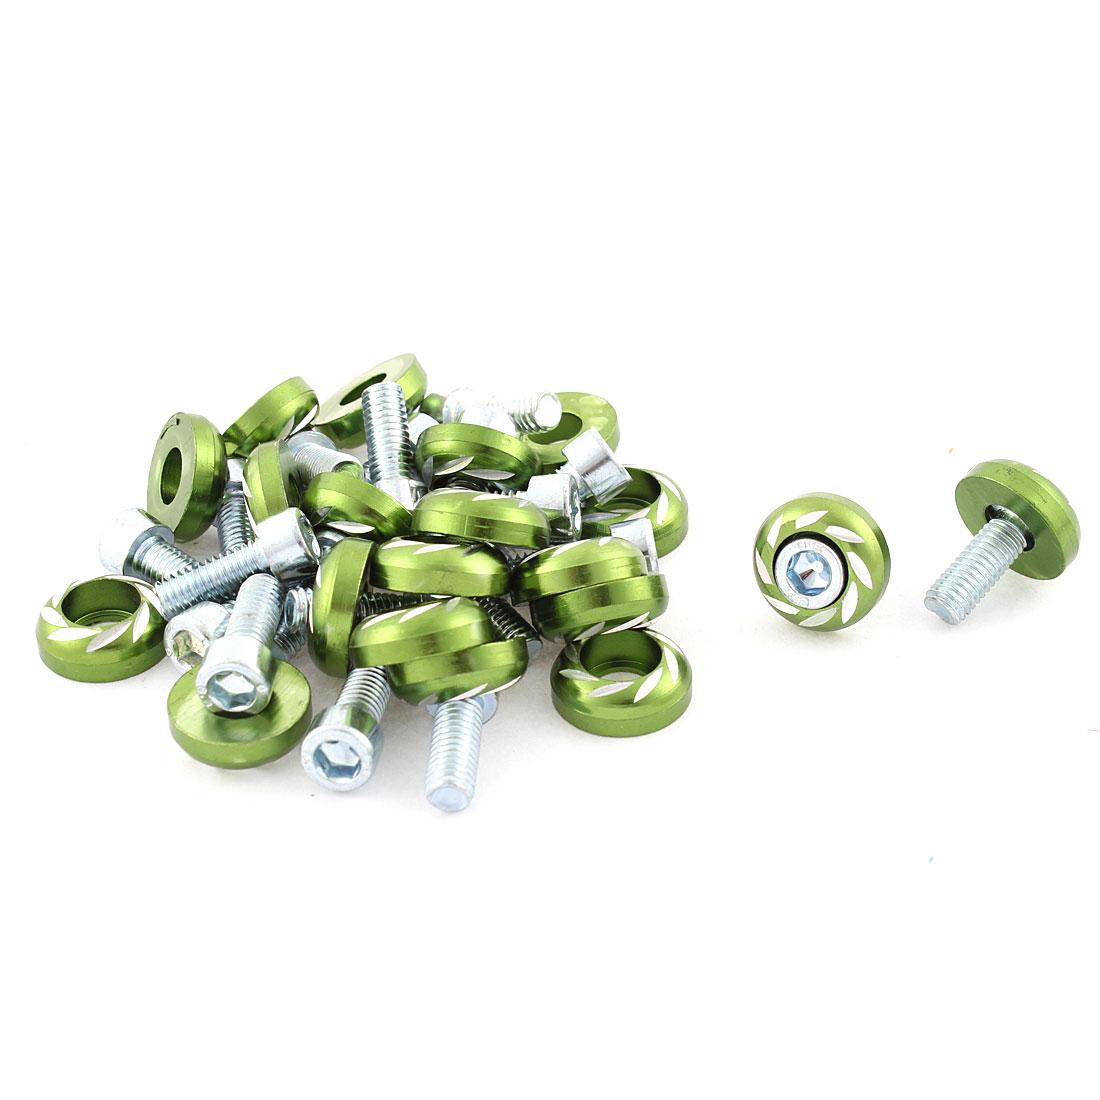 Green 6mm Thread Diameter Round Head Shape Car License Plate Bolt Screws 20pcs